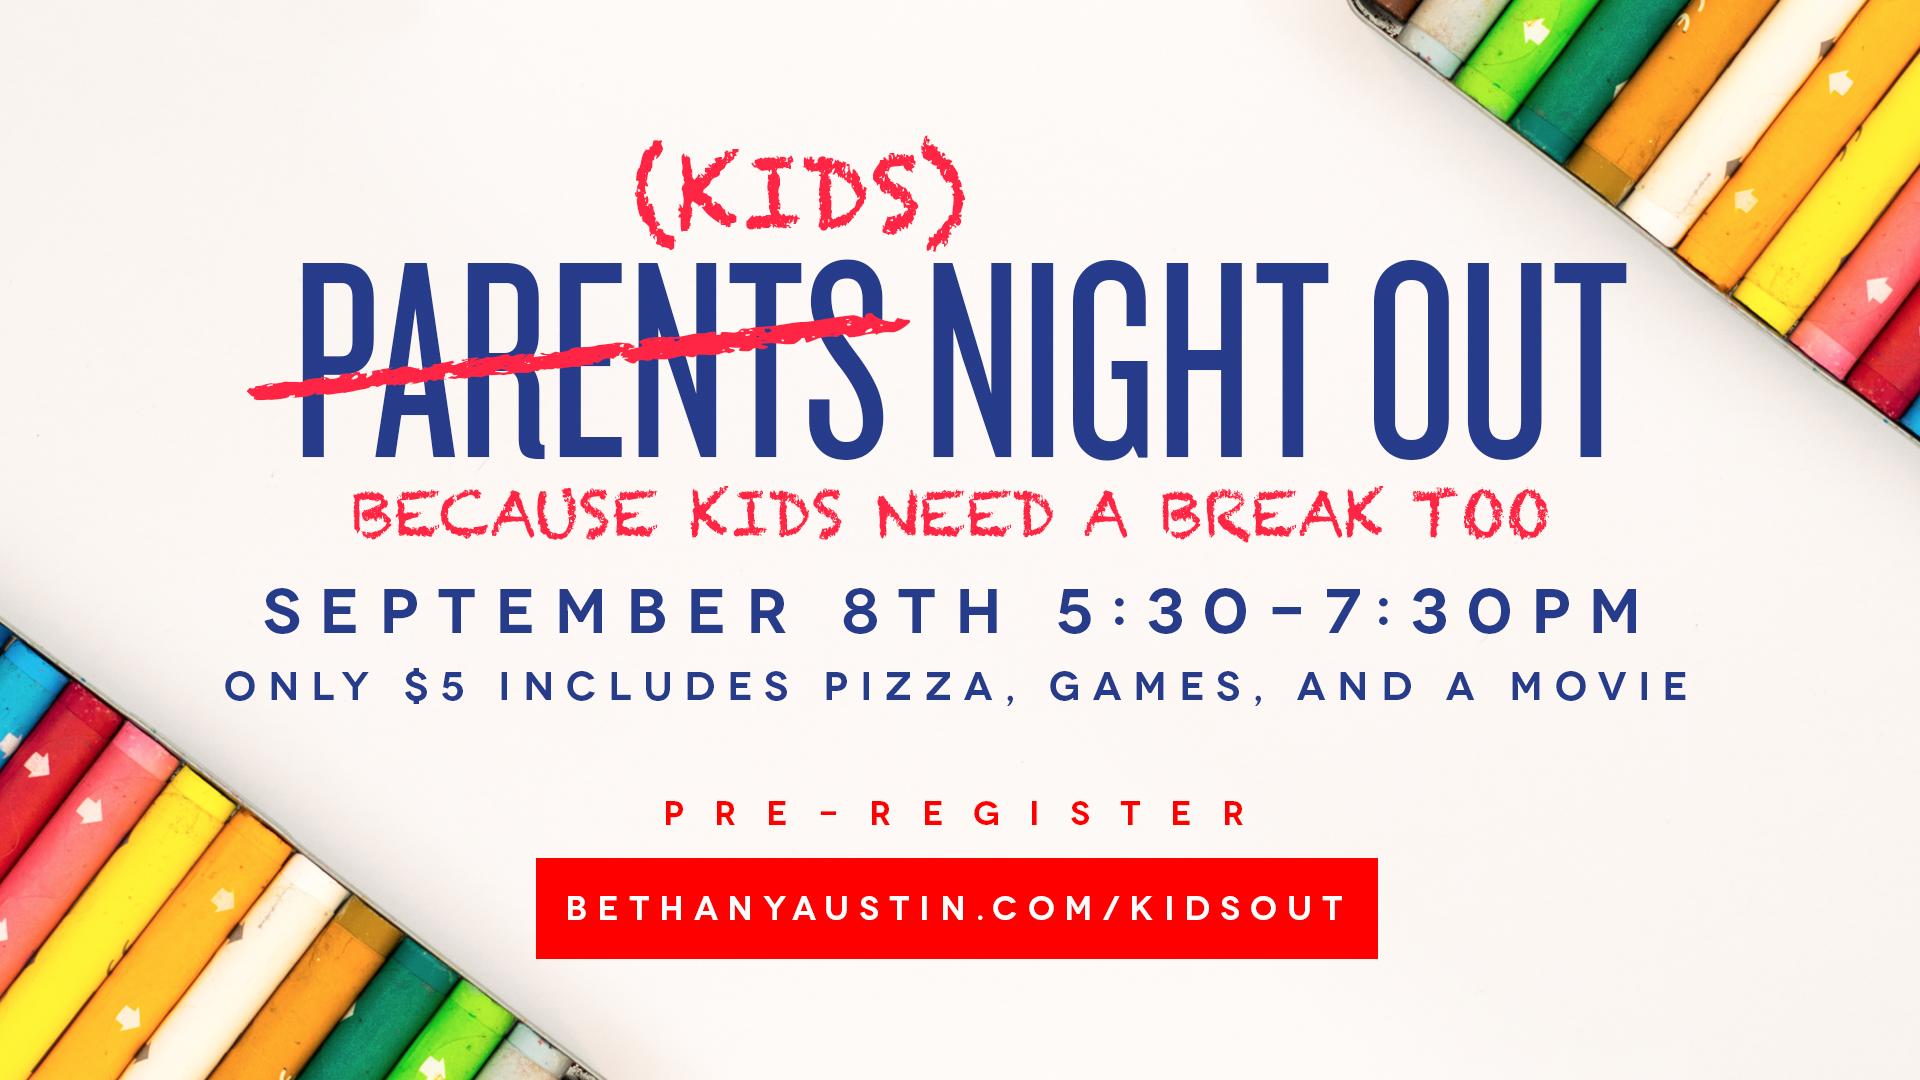 Kidsnightout backtoschoolv2